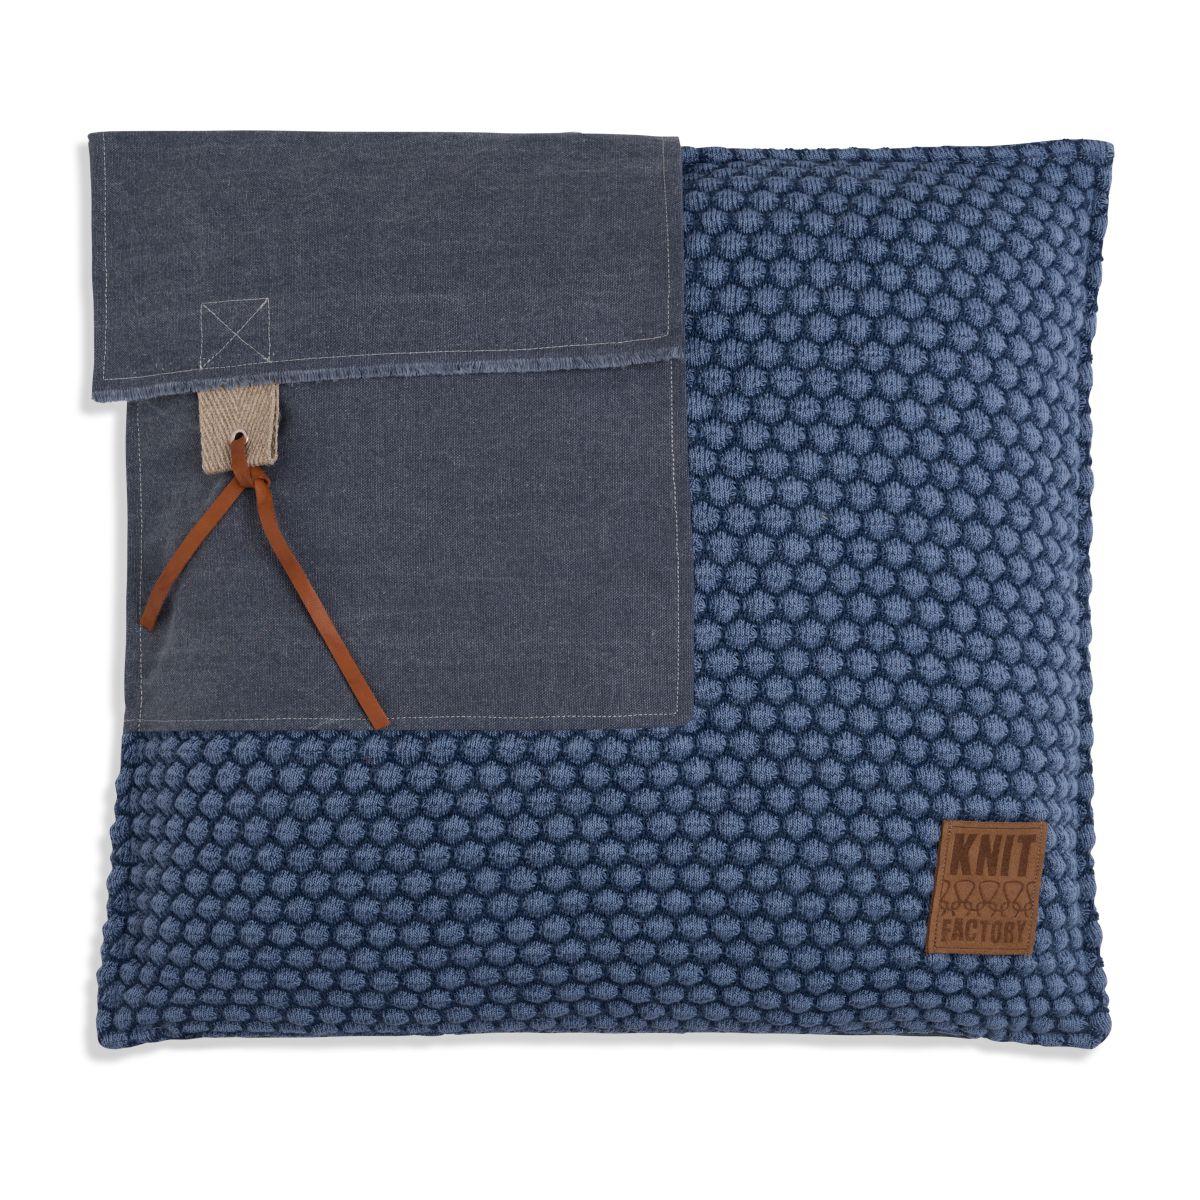 knit factory 1251254 kussen 50x50 jack jeans indigo 1